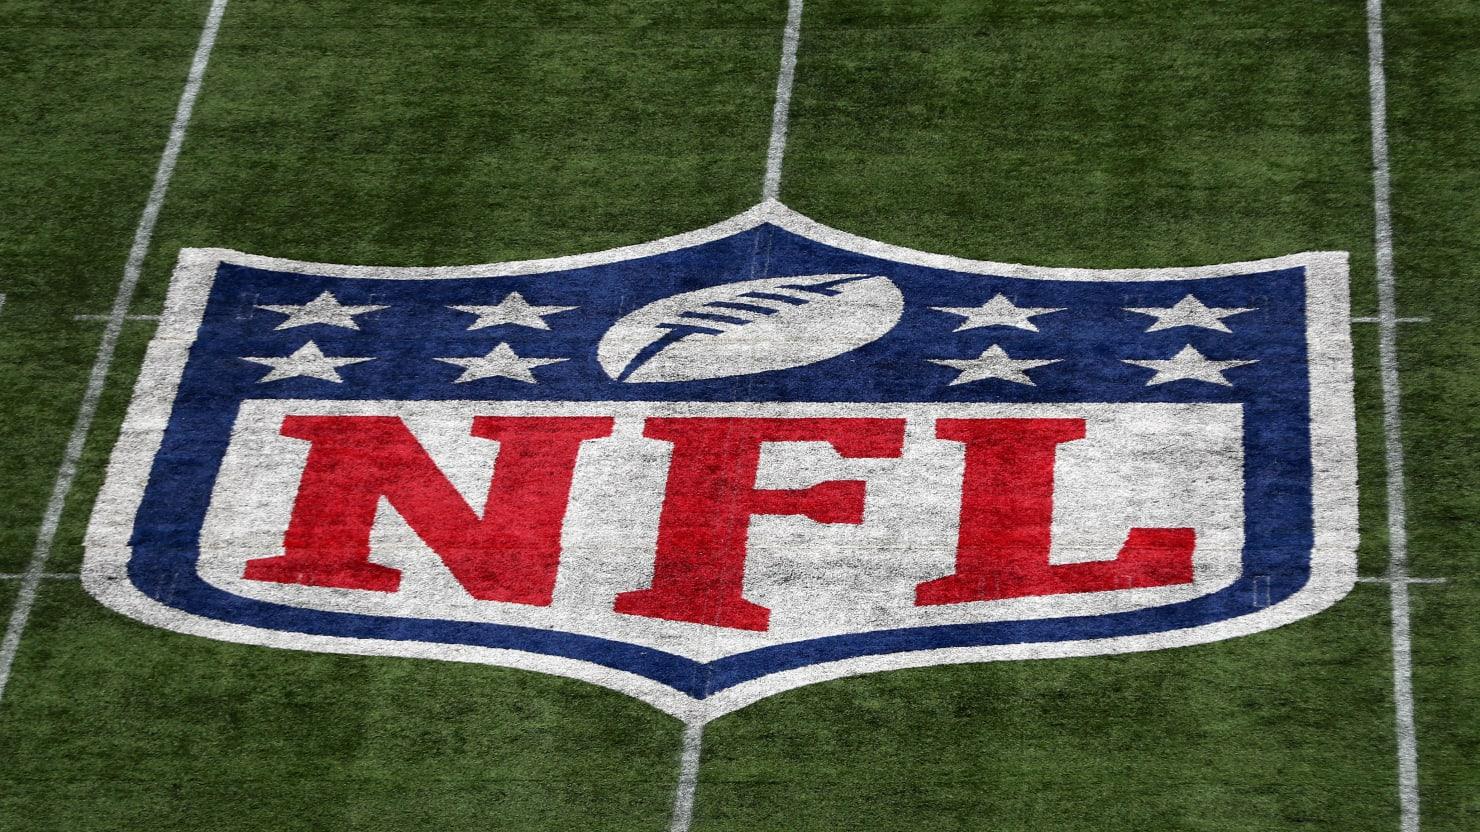 Clinton Portis, Former NFL Stars Stole Nearly $4 Million From League Health-Care Program: DOJ